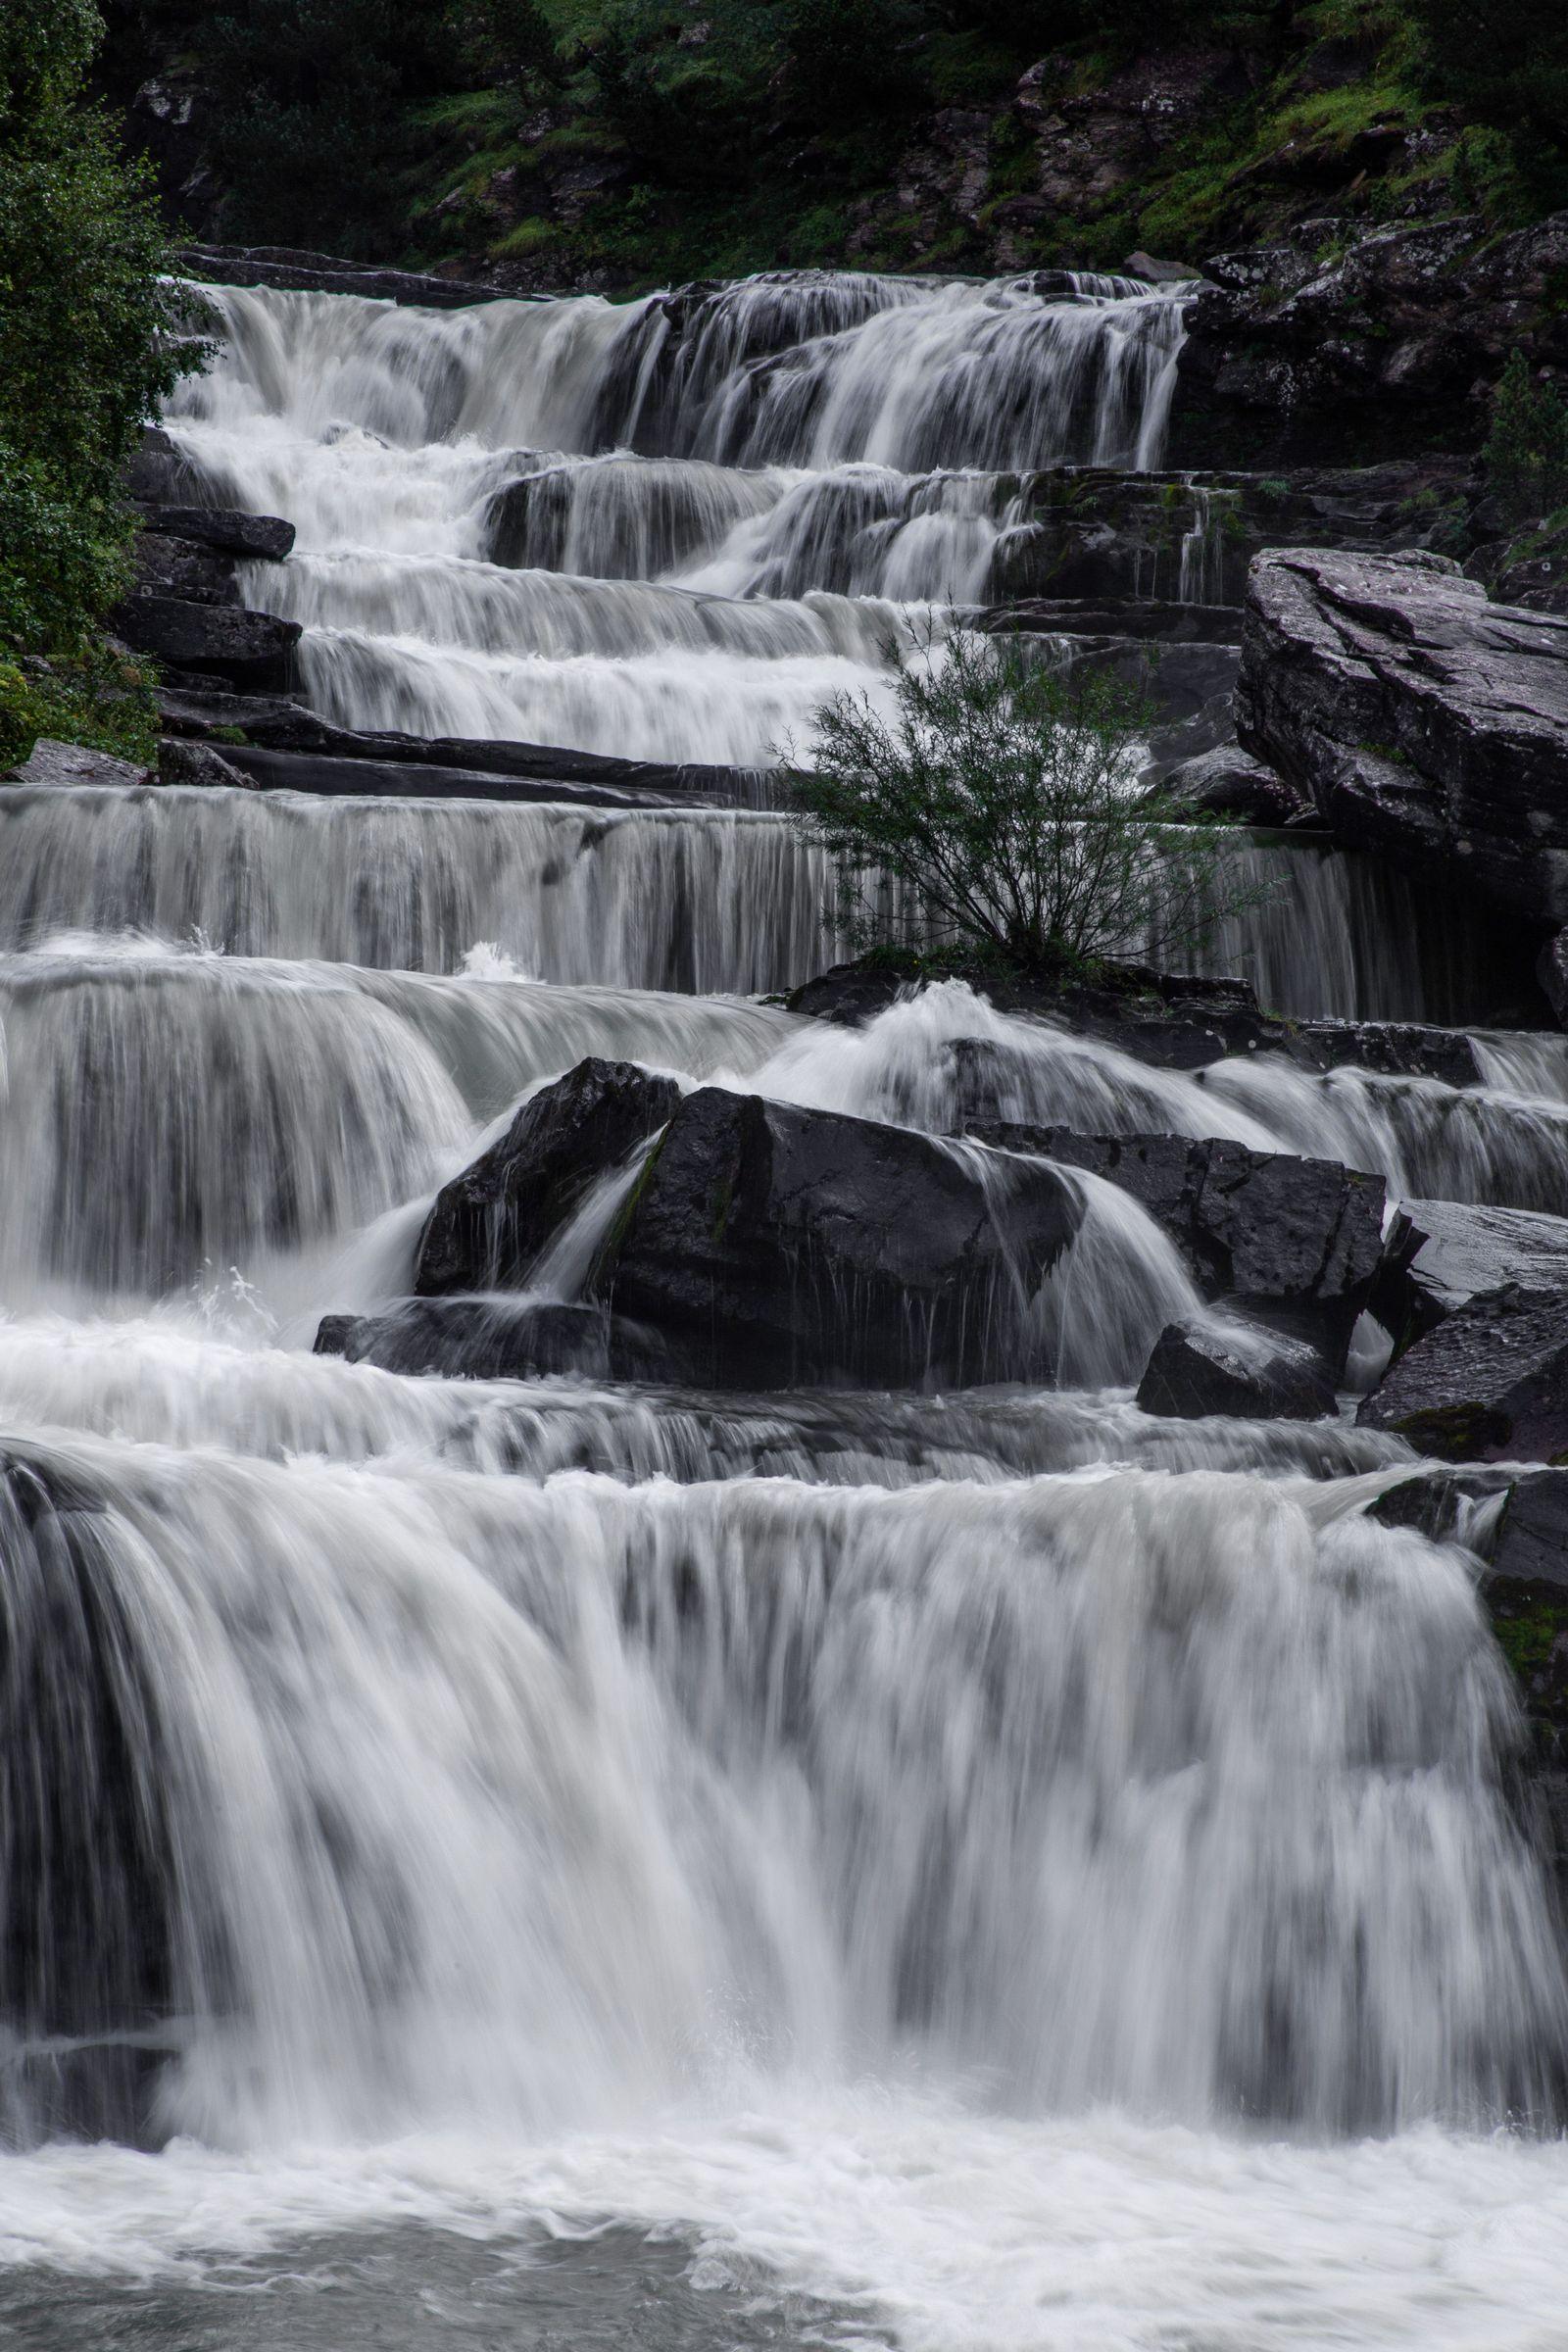 Un detalle de los múltiples saltos que da el agua